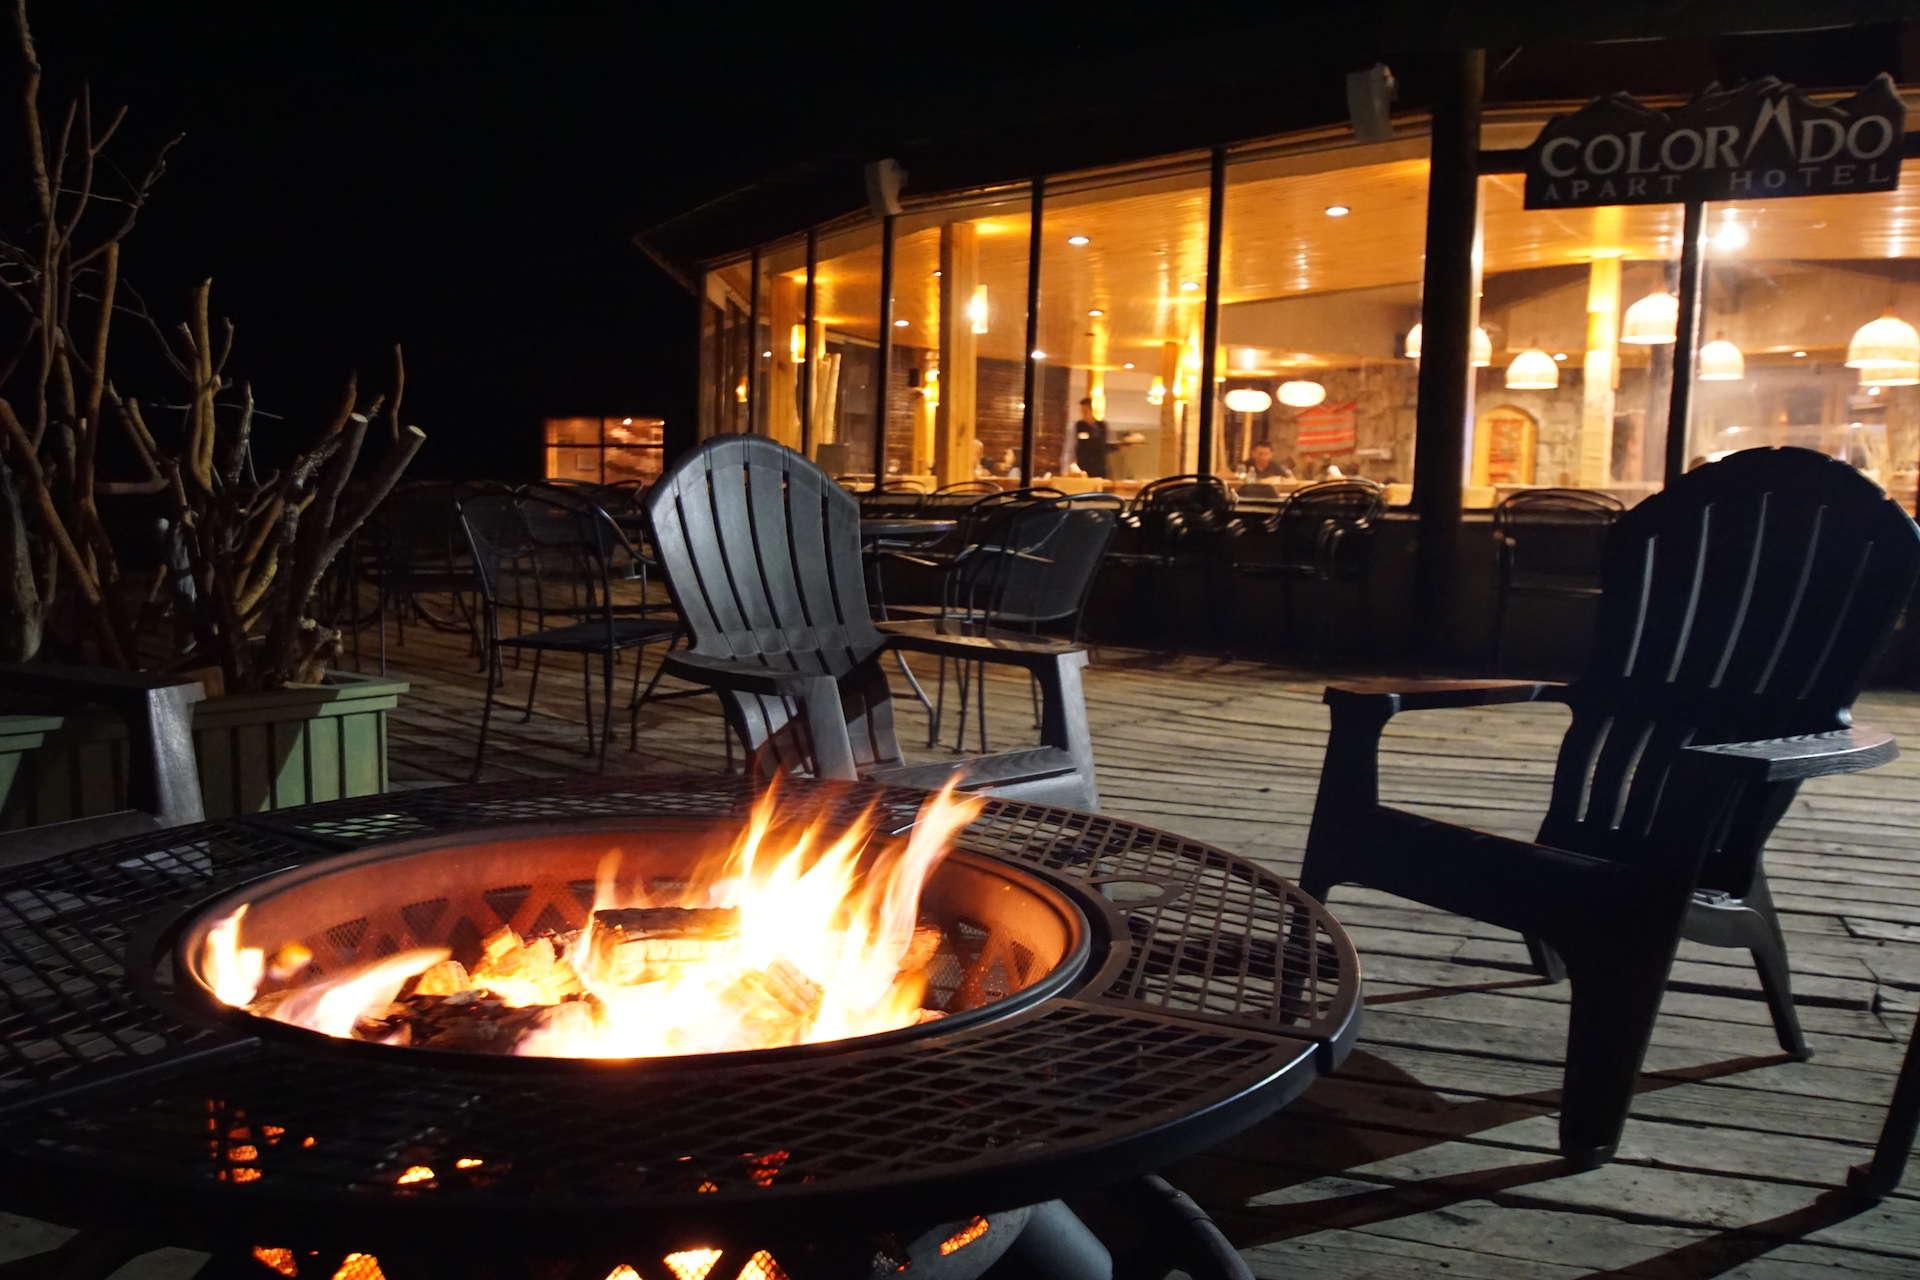 Restaurante Noche Fire Pit Colorado Apart Hotel